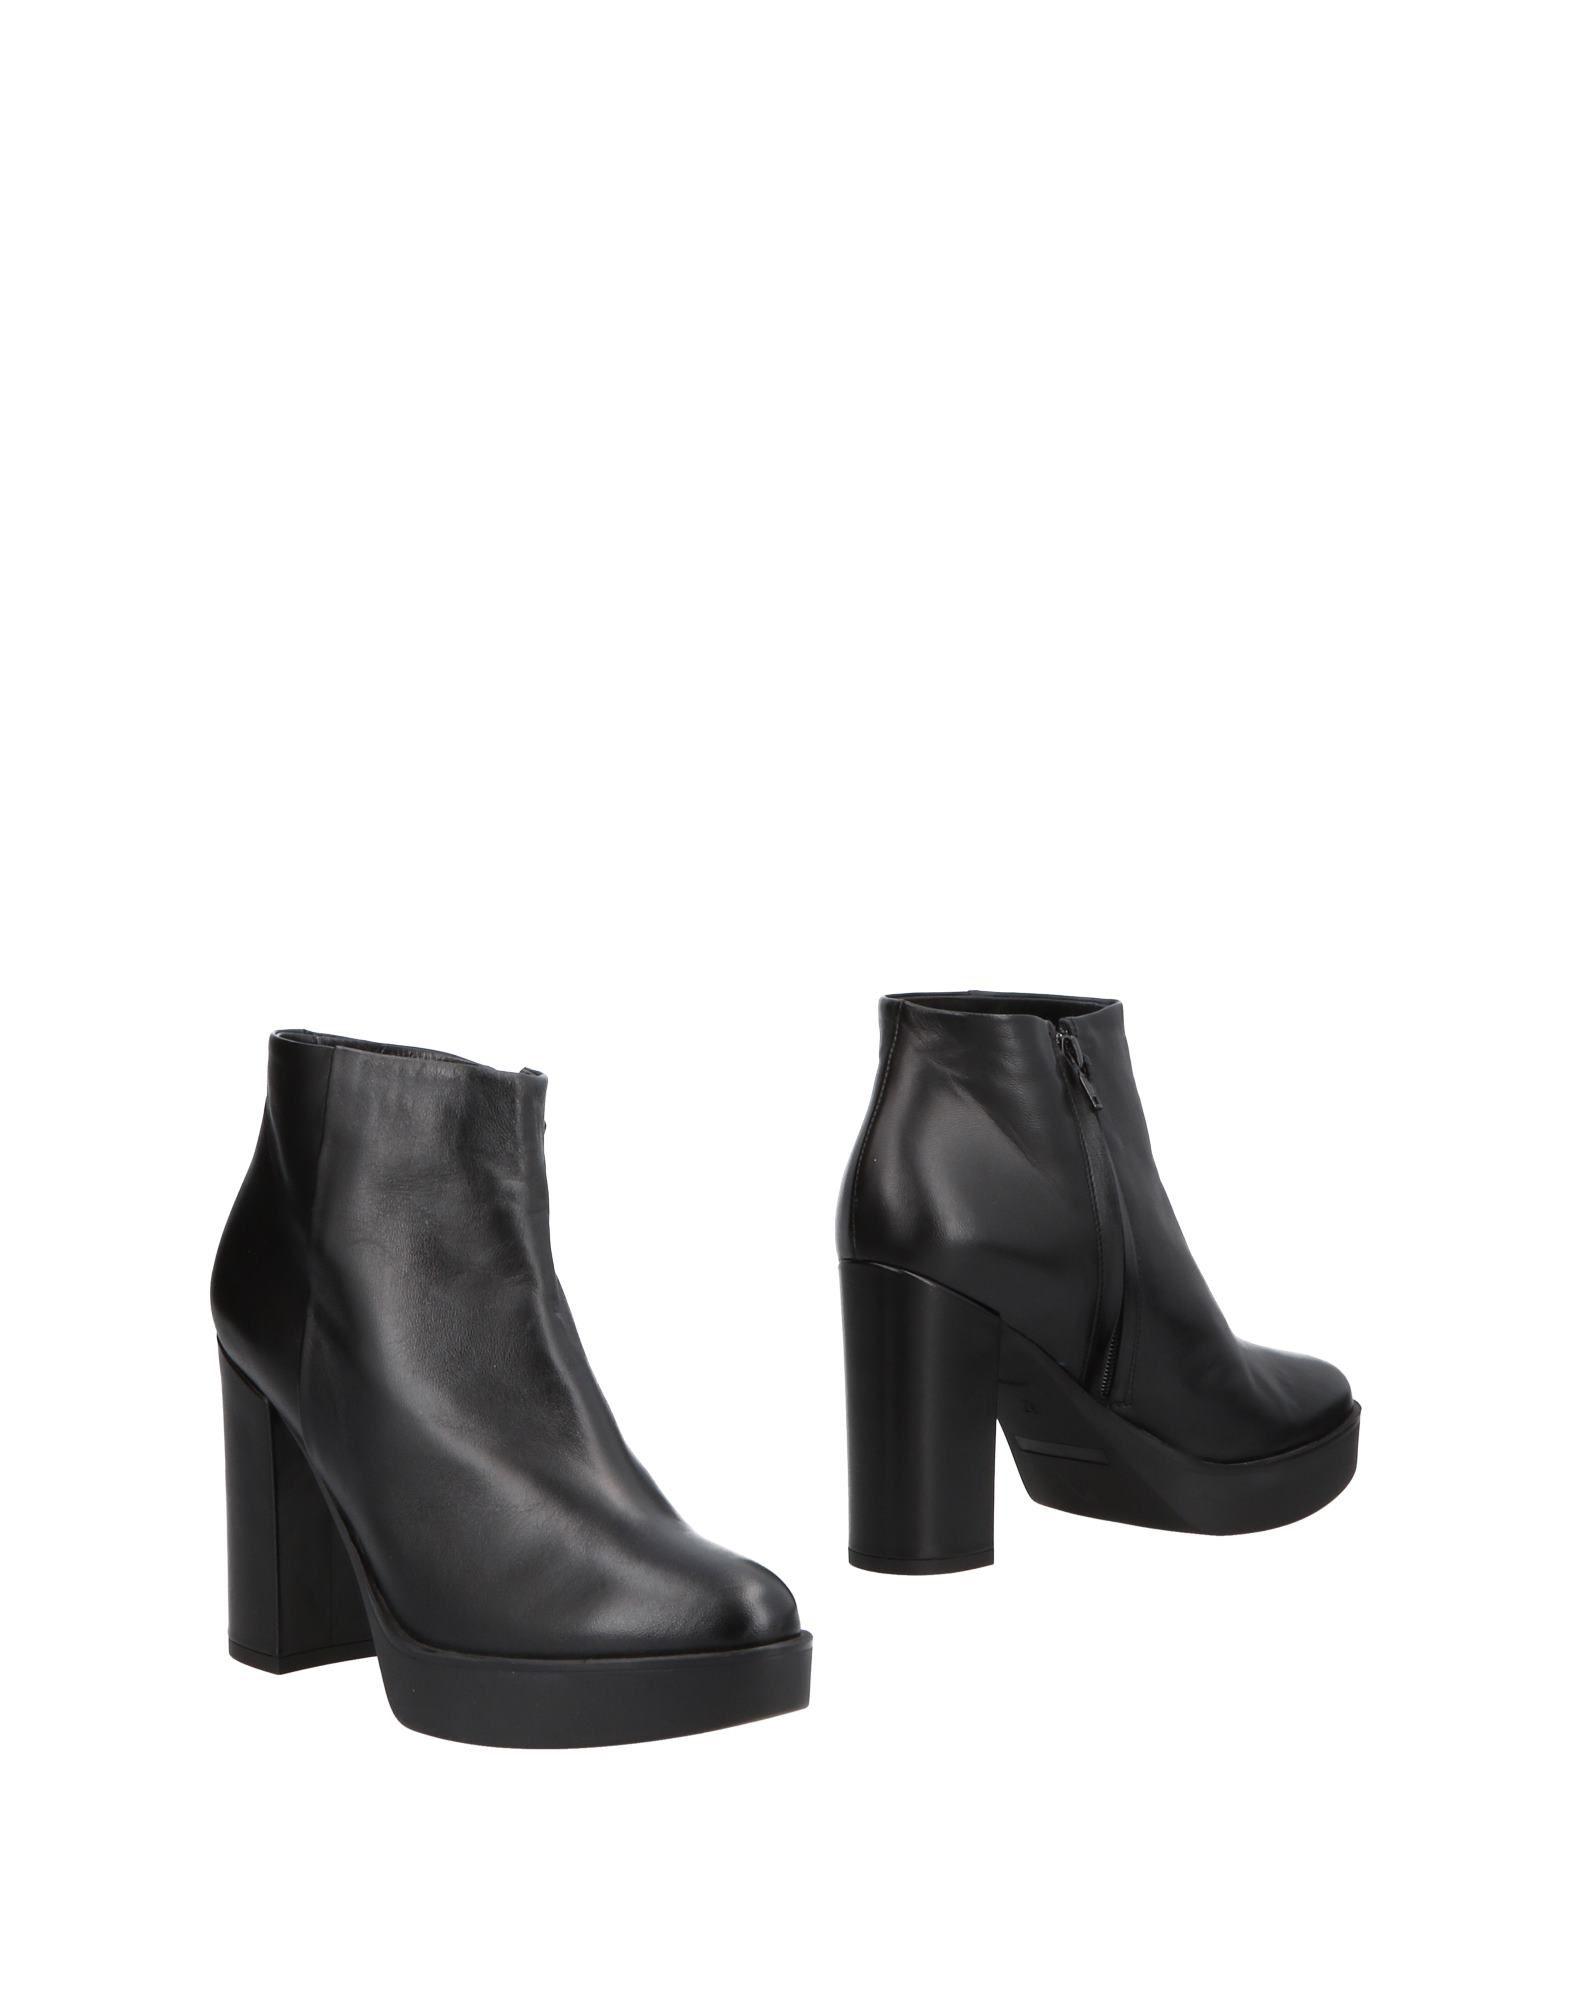 Stilvolle billige Schuhe Studio Spiga 11504203IE Stiefelette Damen  11504203IE Spiga 578572